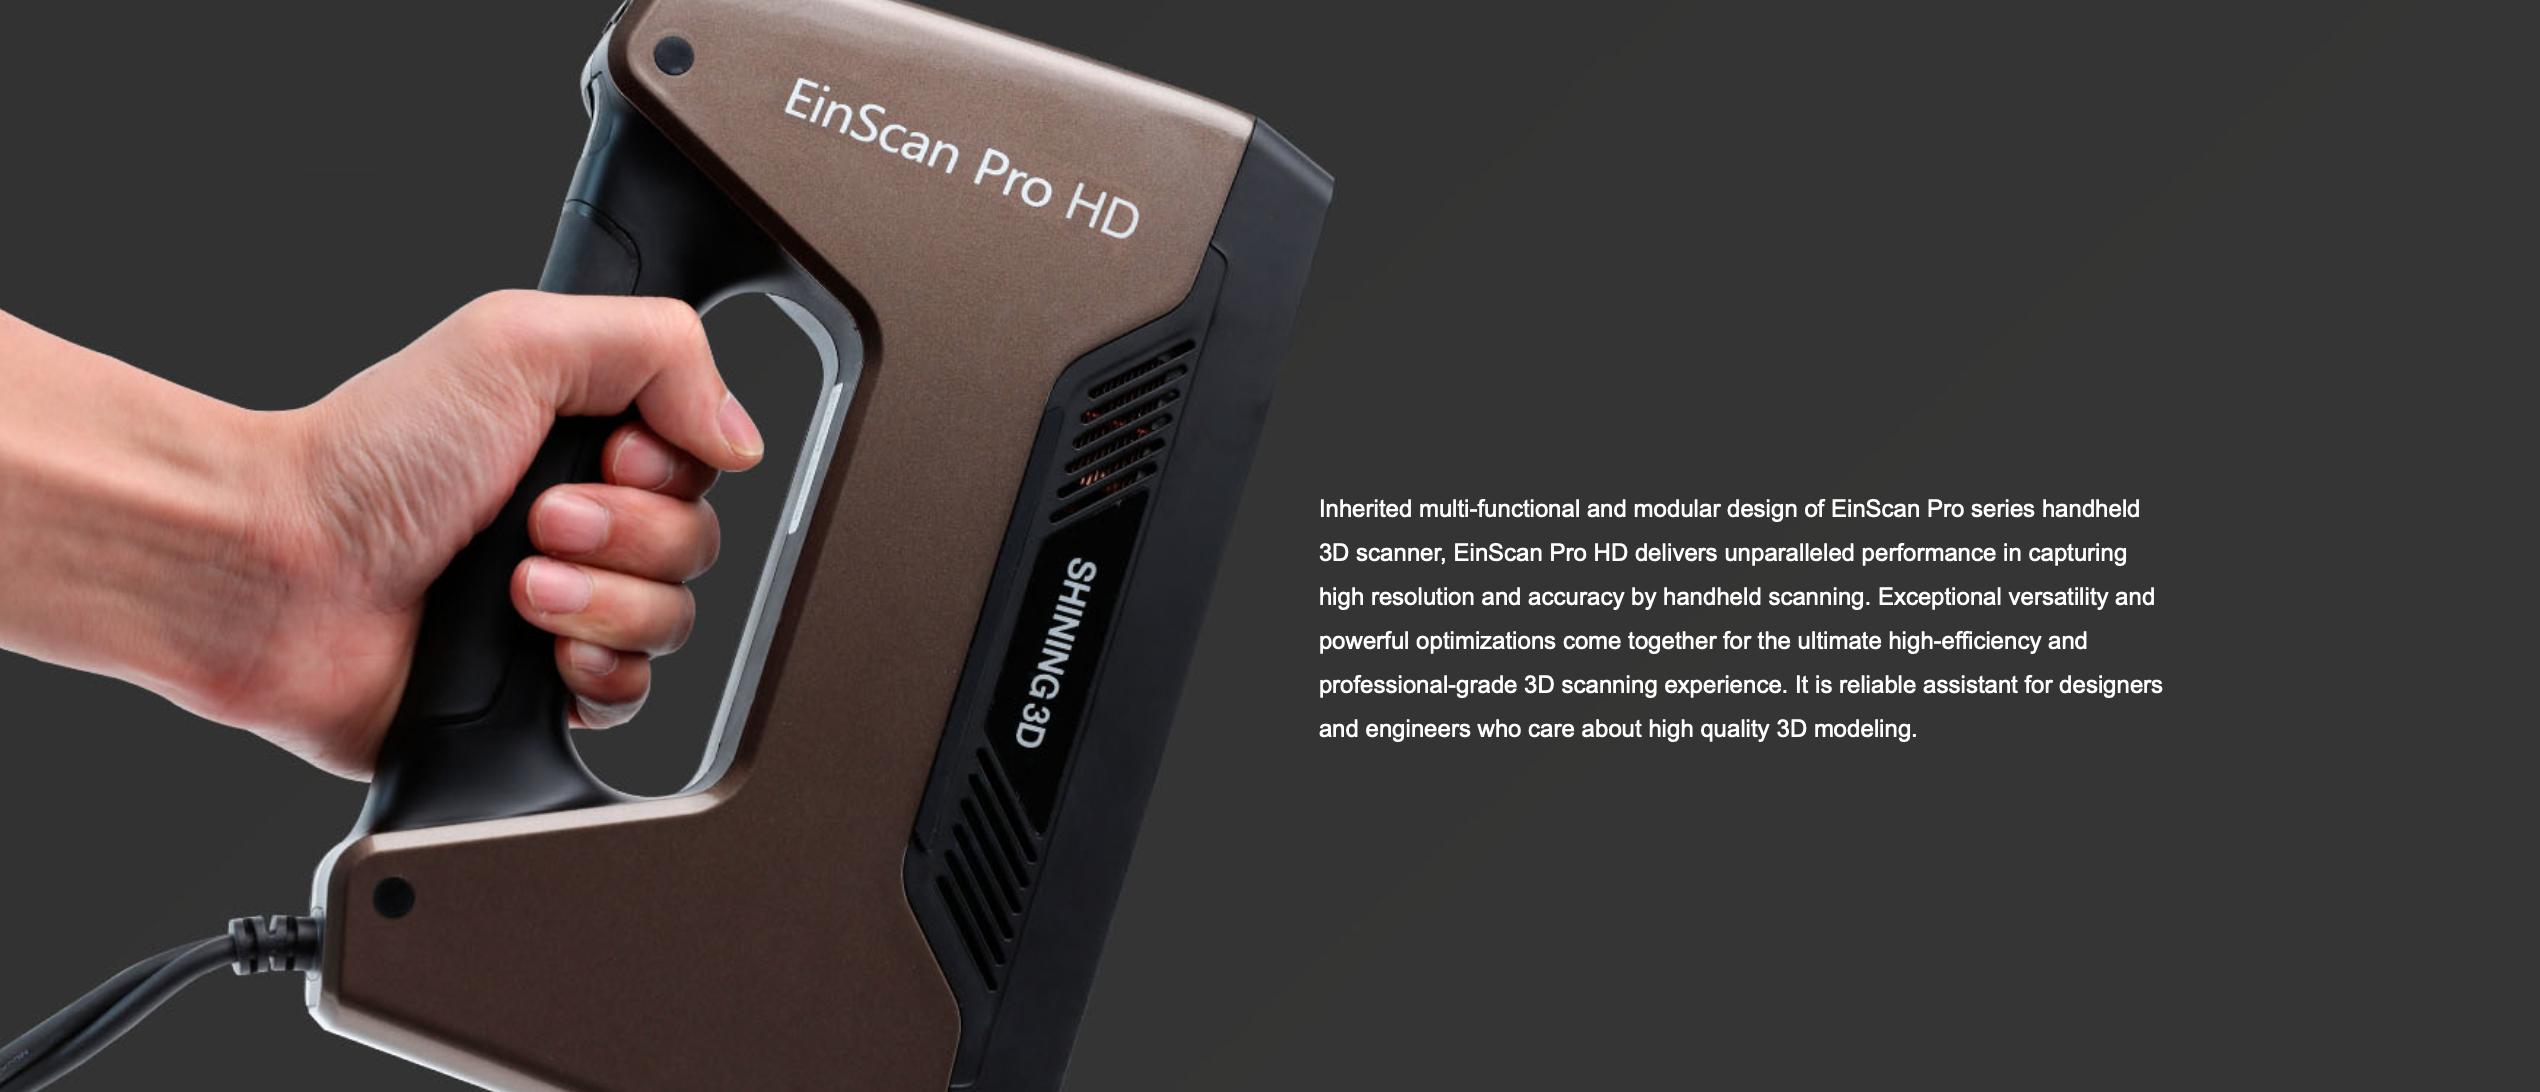 EinScan Pro HD OVERVIEW